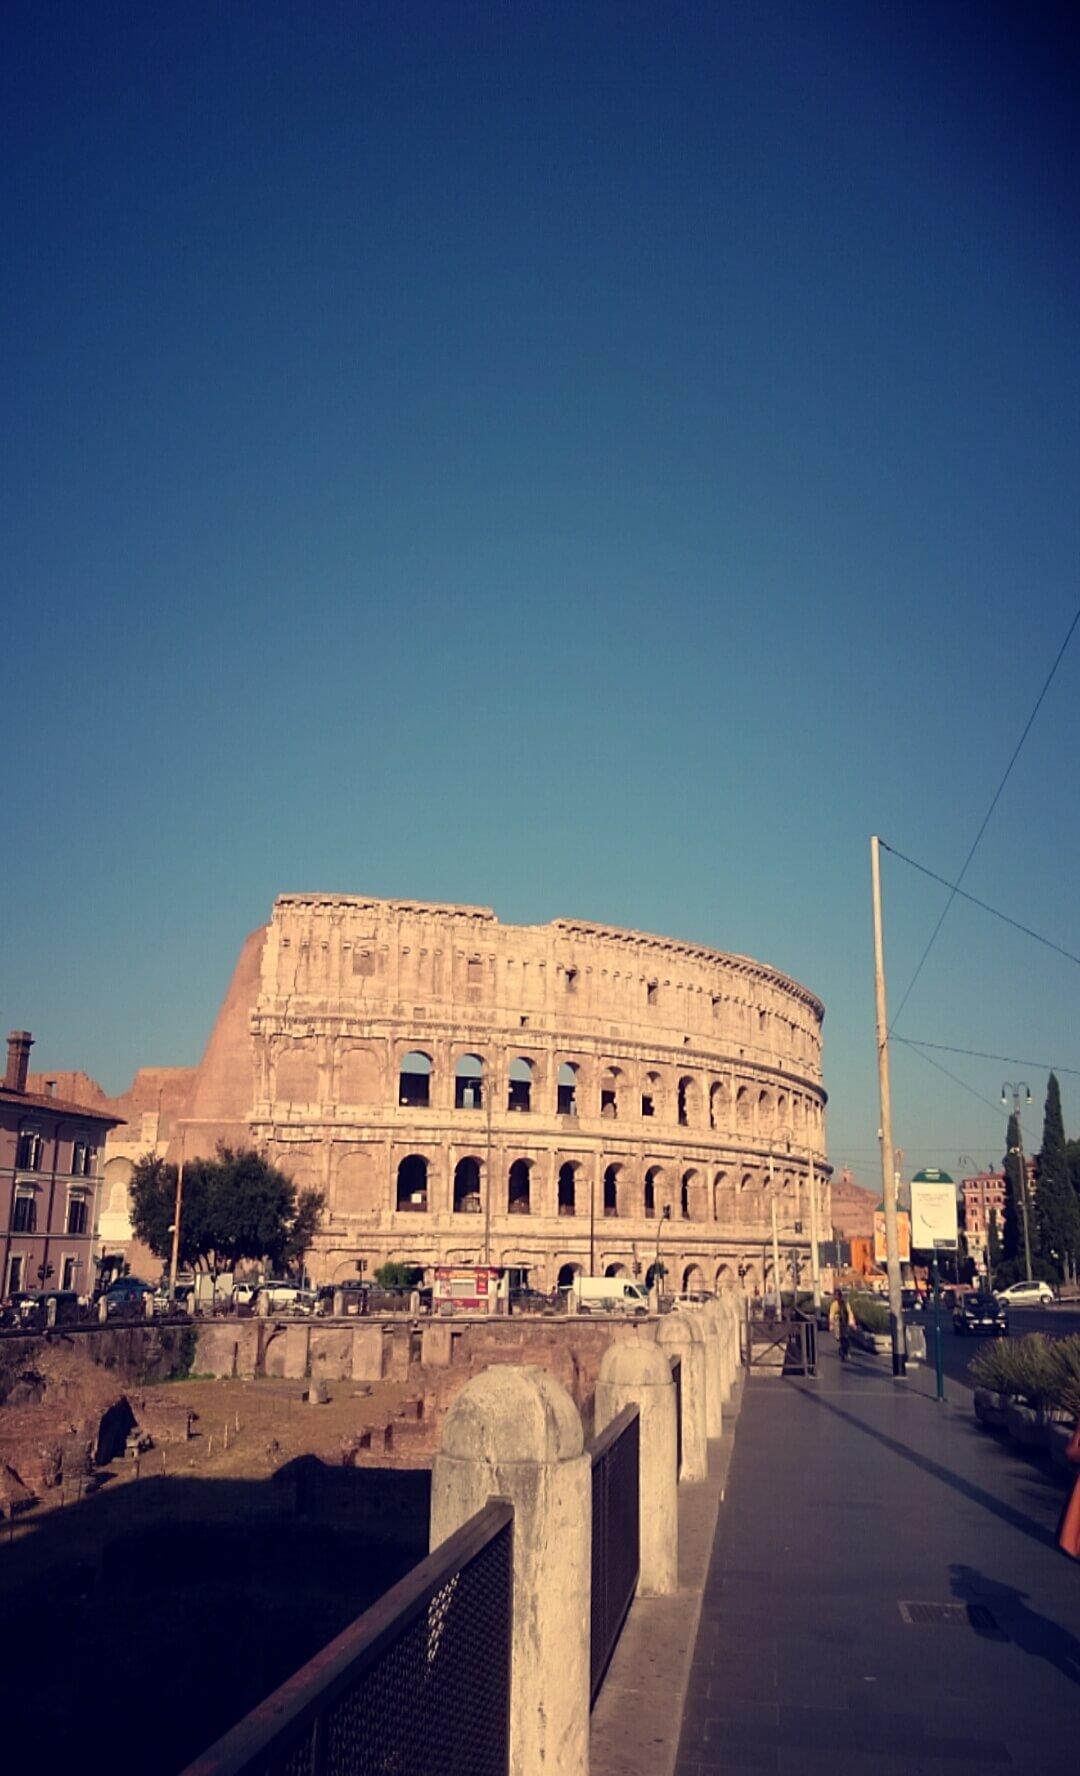 rome city pass free admission public transport. Black Bedroom Furniture Sets. Home Design Ideas